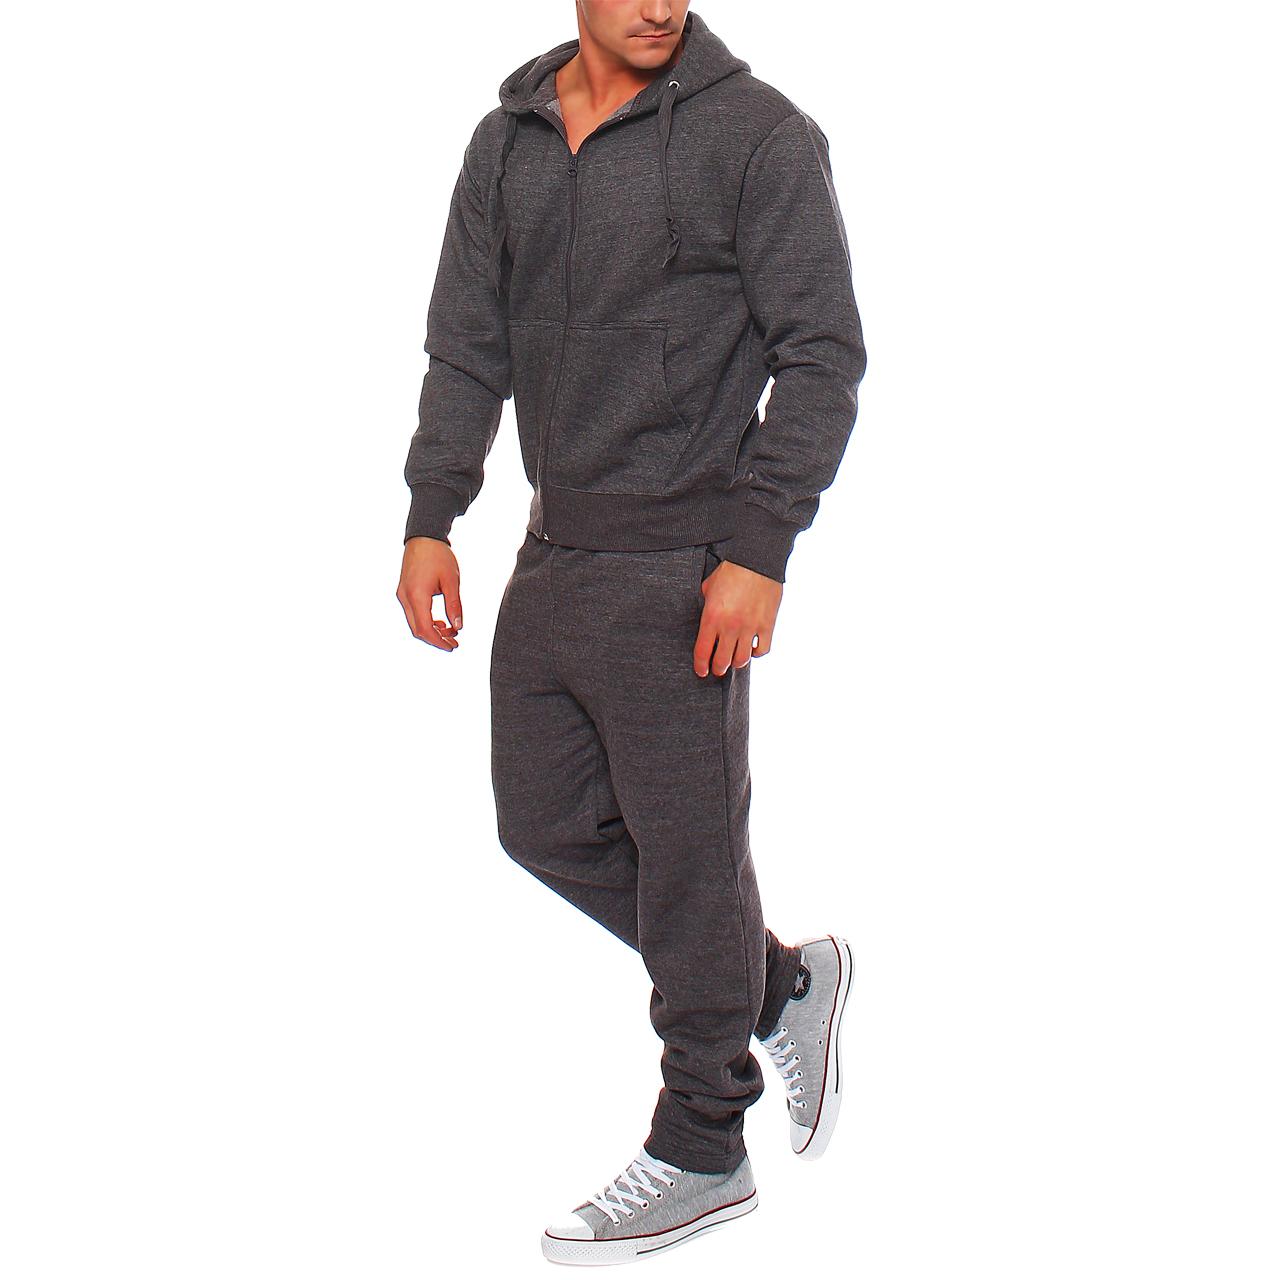 hype inc uomo fare jogging suit tuta da ginnastica felpa pantaloni ebay. Black Bedroom Furniture Sets. Home Design Ideas